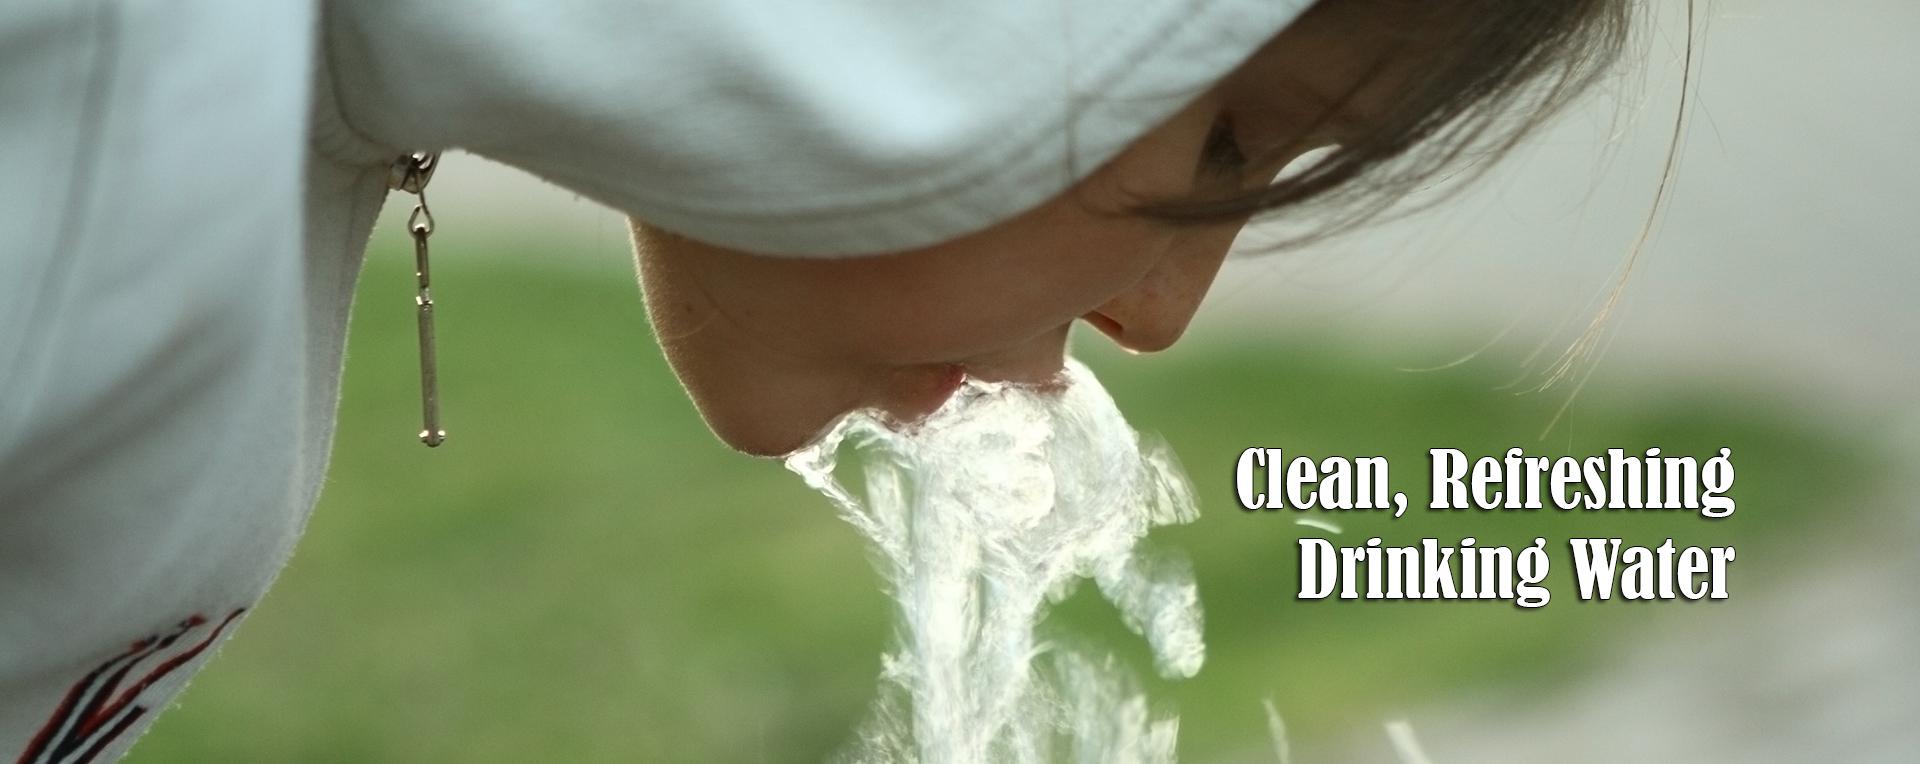 clean refreshing drinking water from Leeds Water Works Board Leeds Alabama